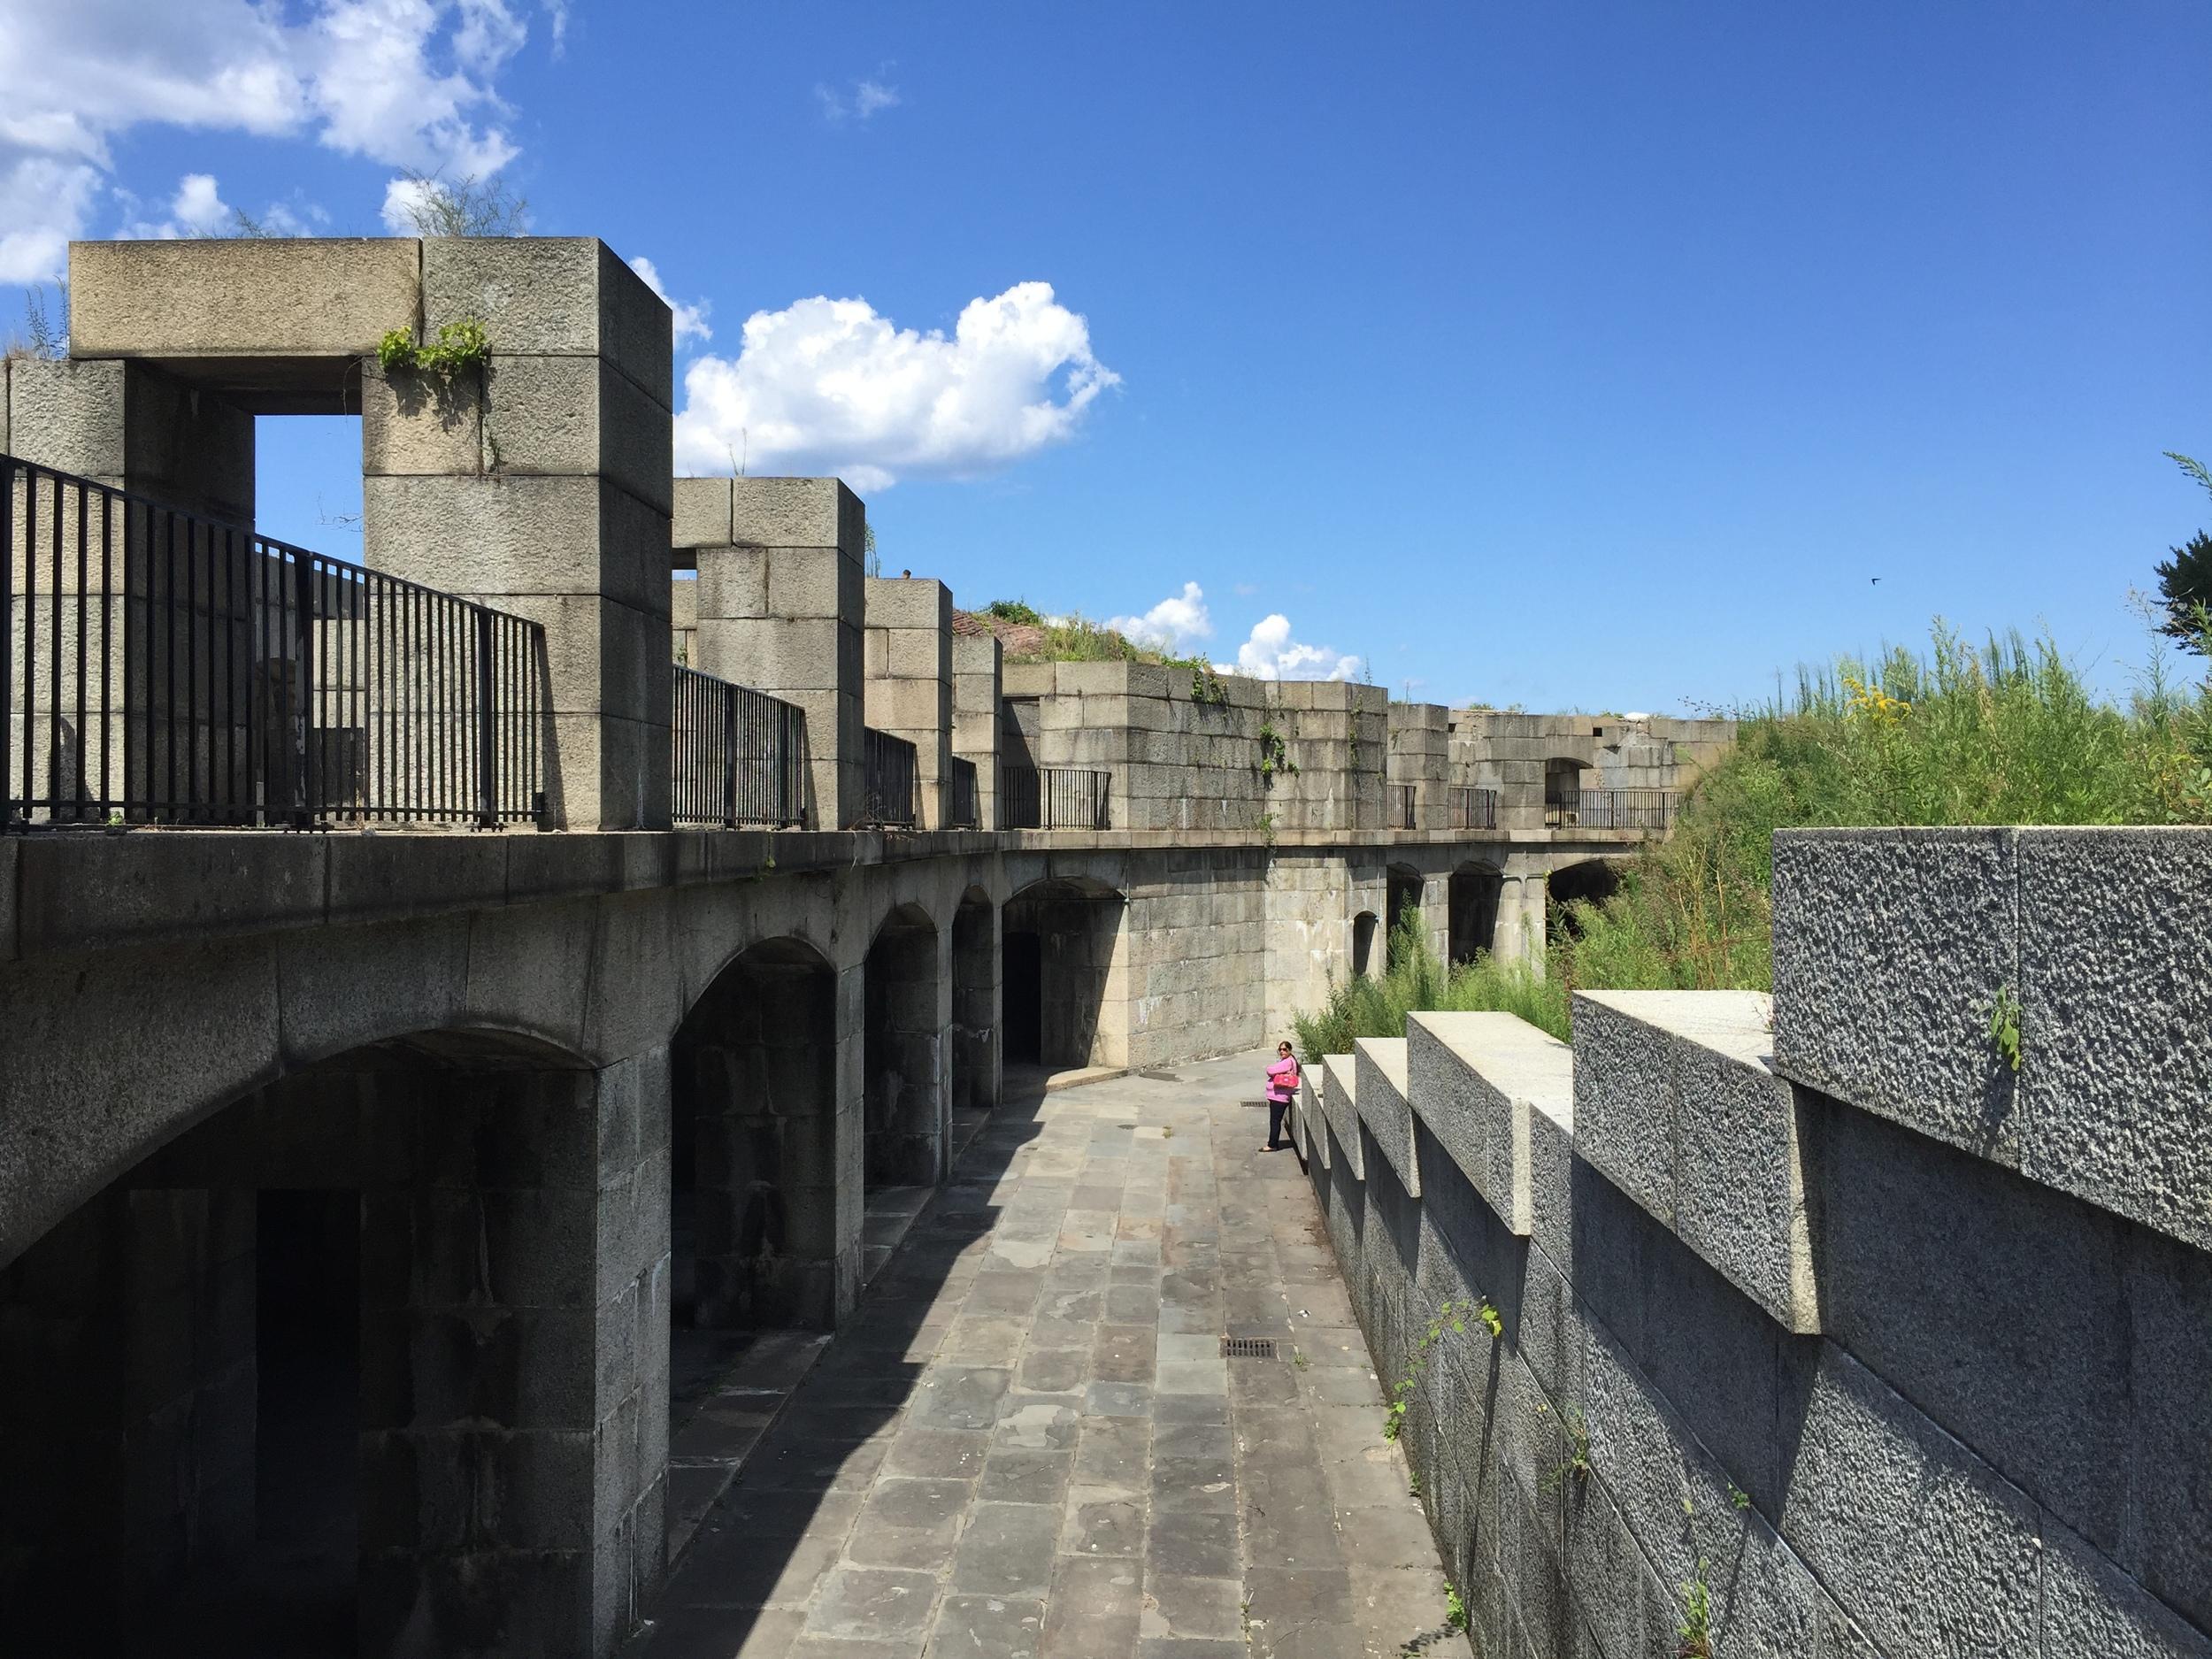 provencal-pan-bagnat-fort-totten-battery